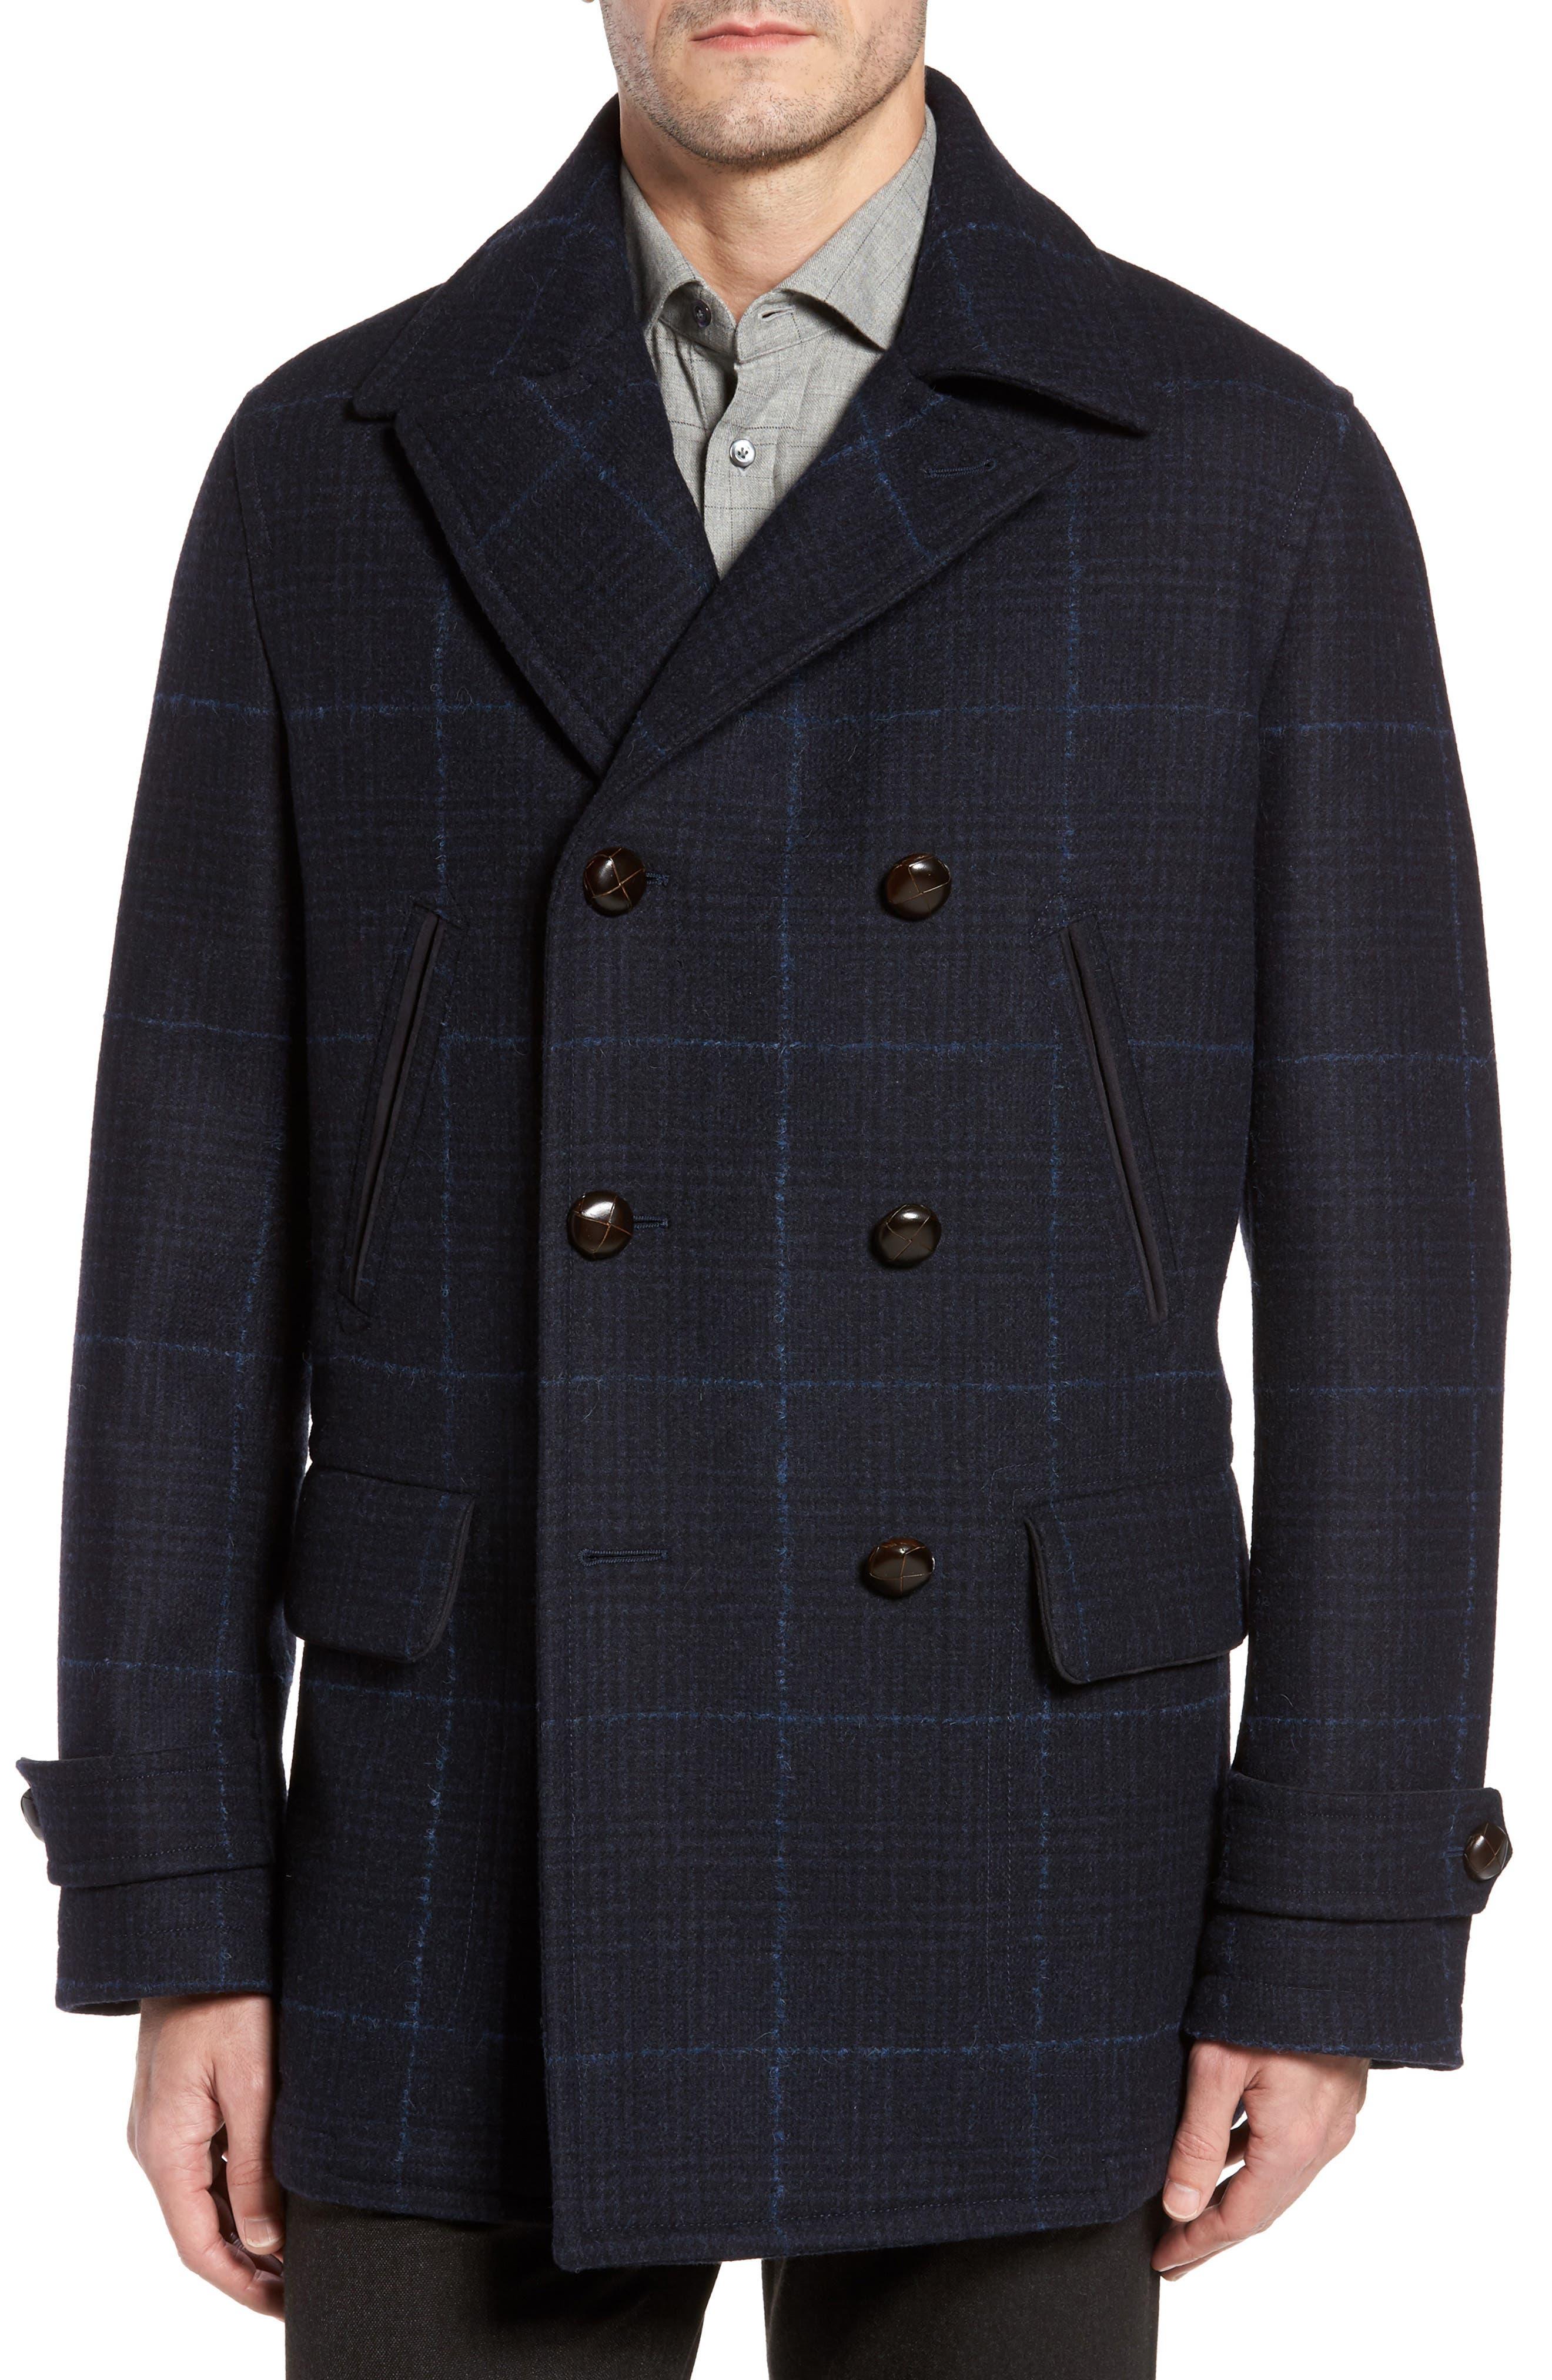 Alternate Image 1 Selected - Luciano Barbera Wool Plaid Peacoat